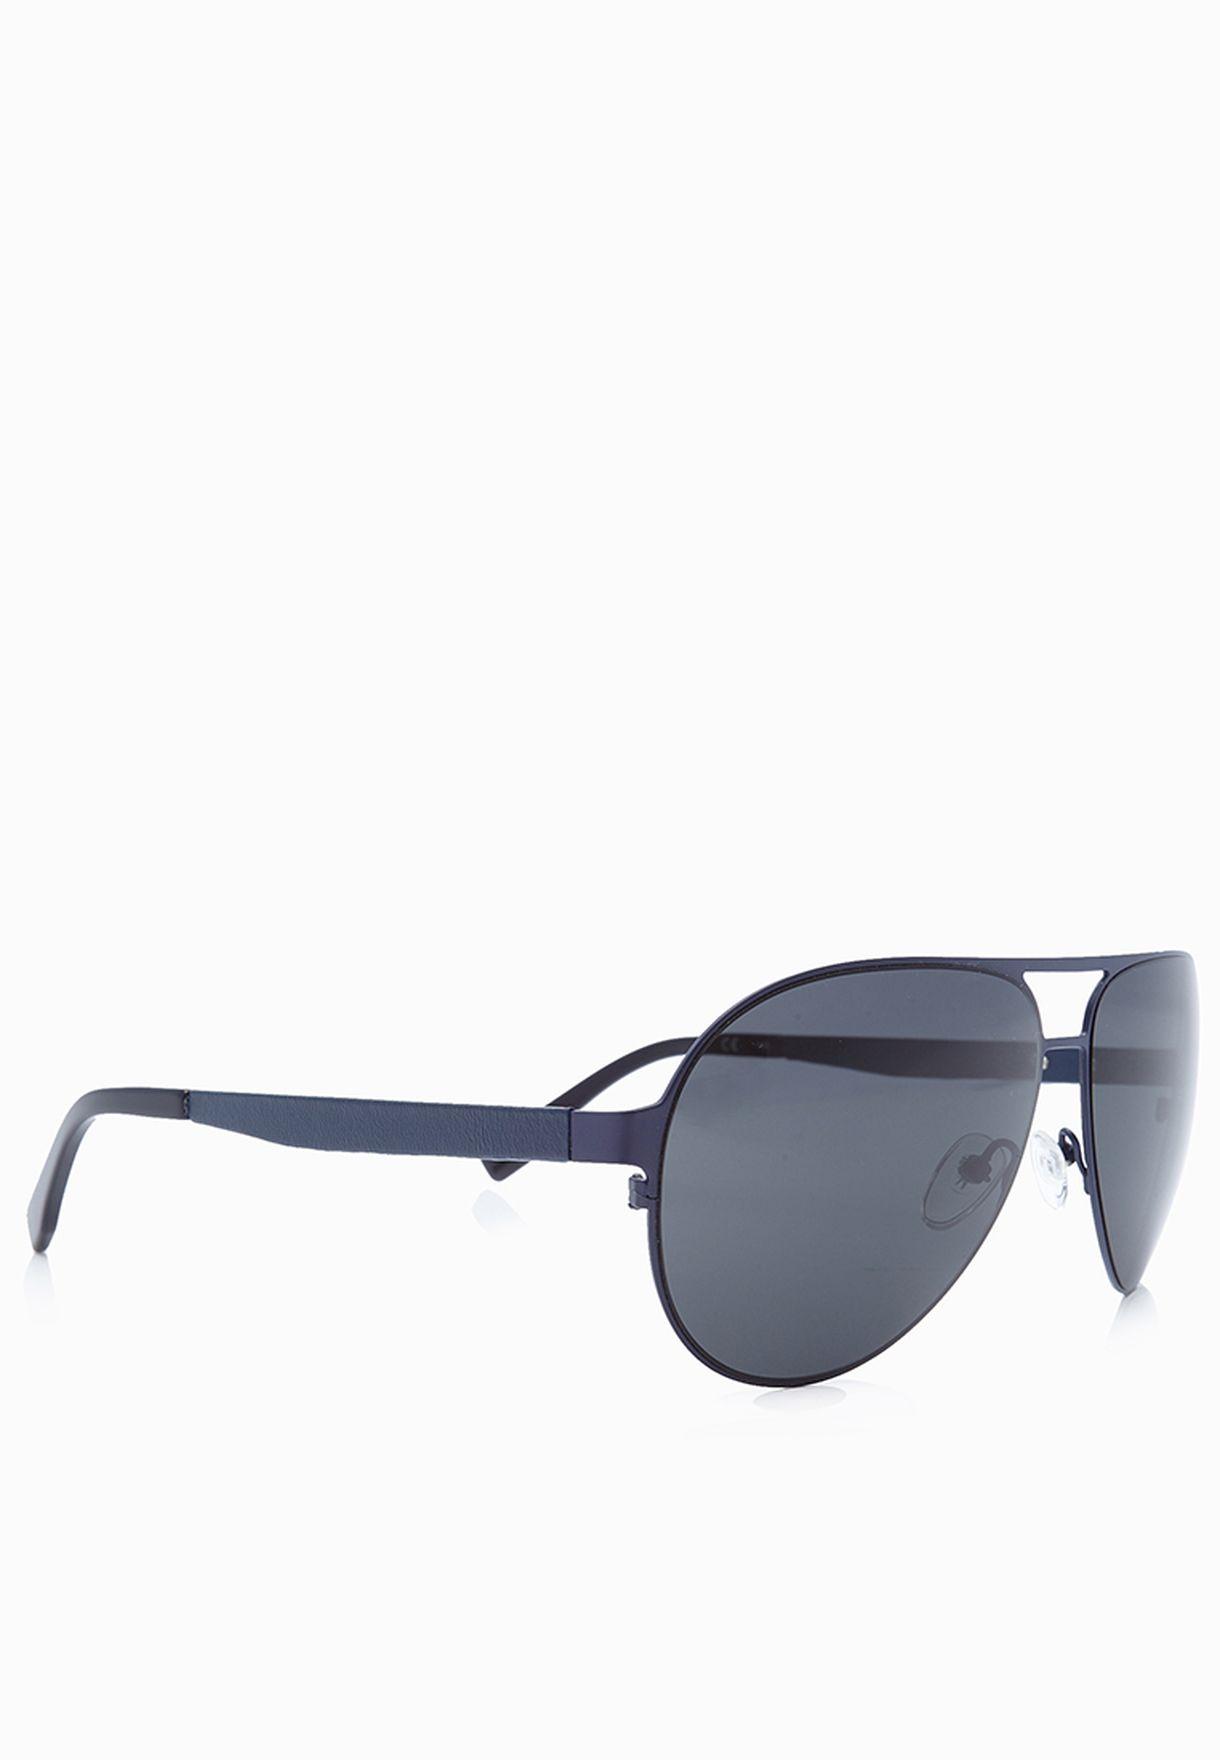 d207e673e تسوق نظارة شمسية افياتور ماركة لاكوست لون أزرق L159SL-424 في عمان ...